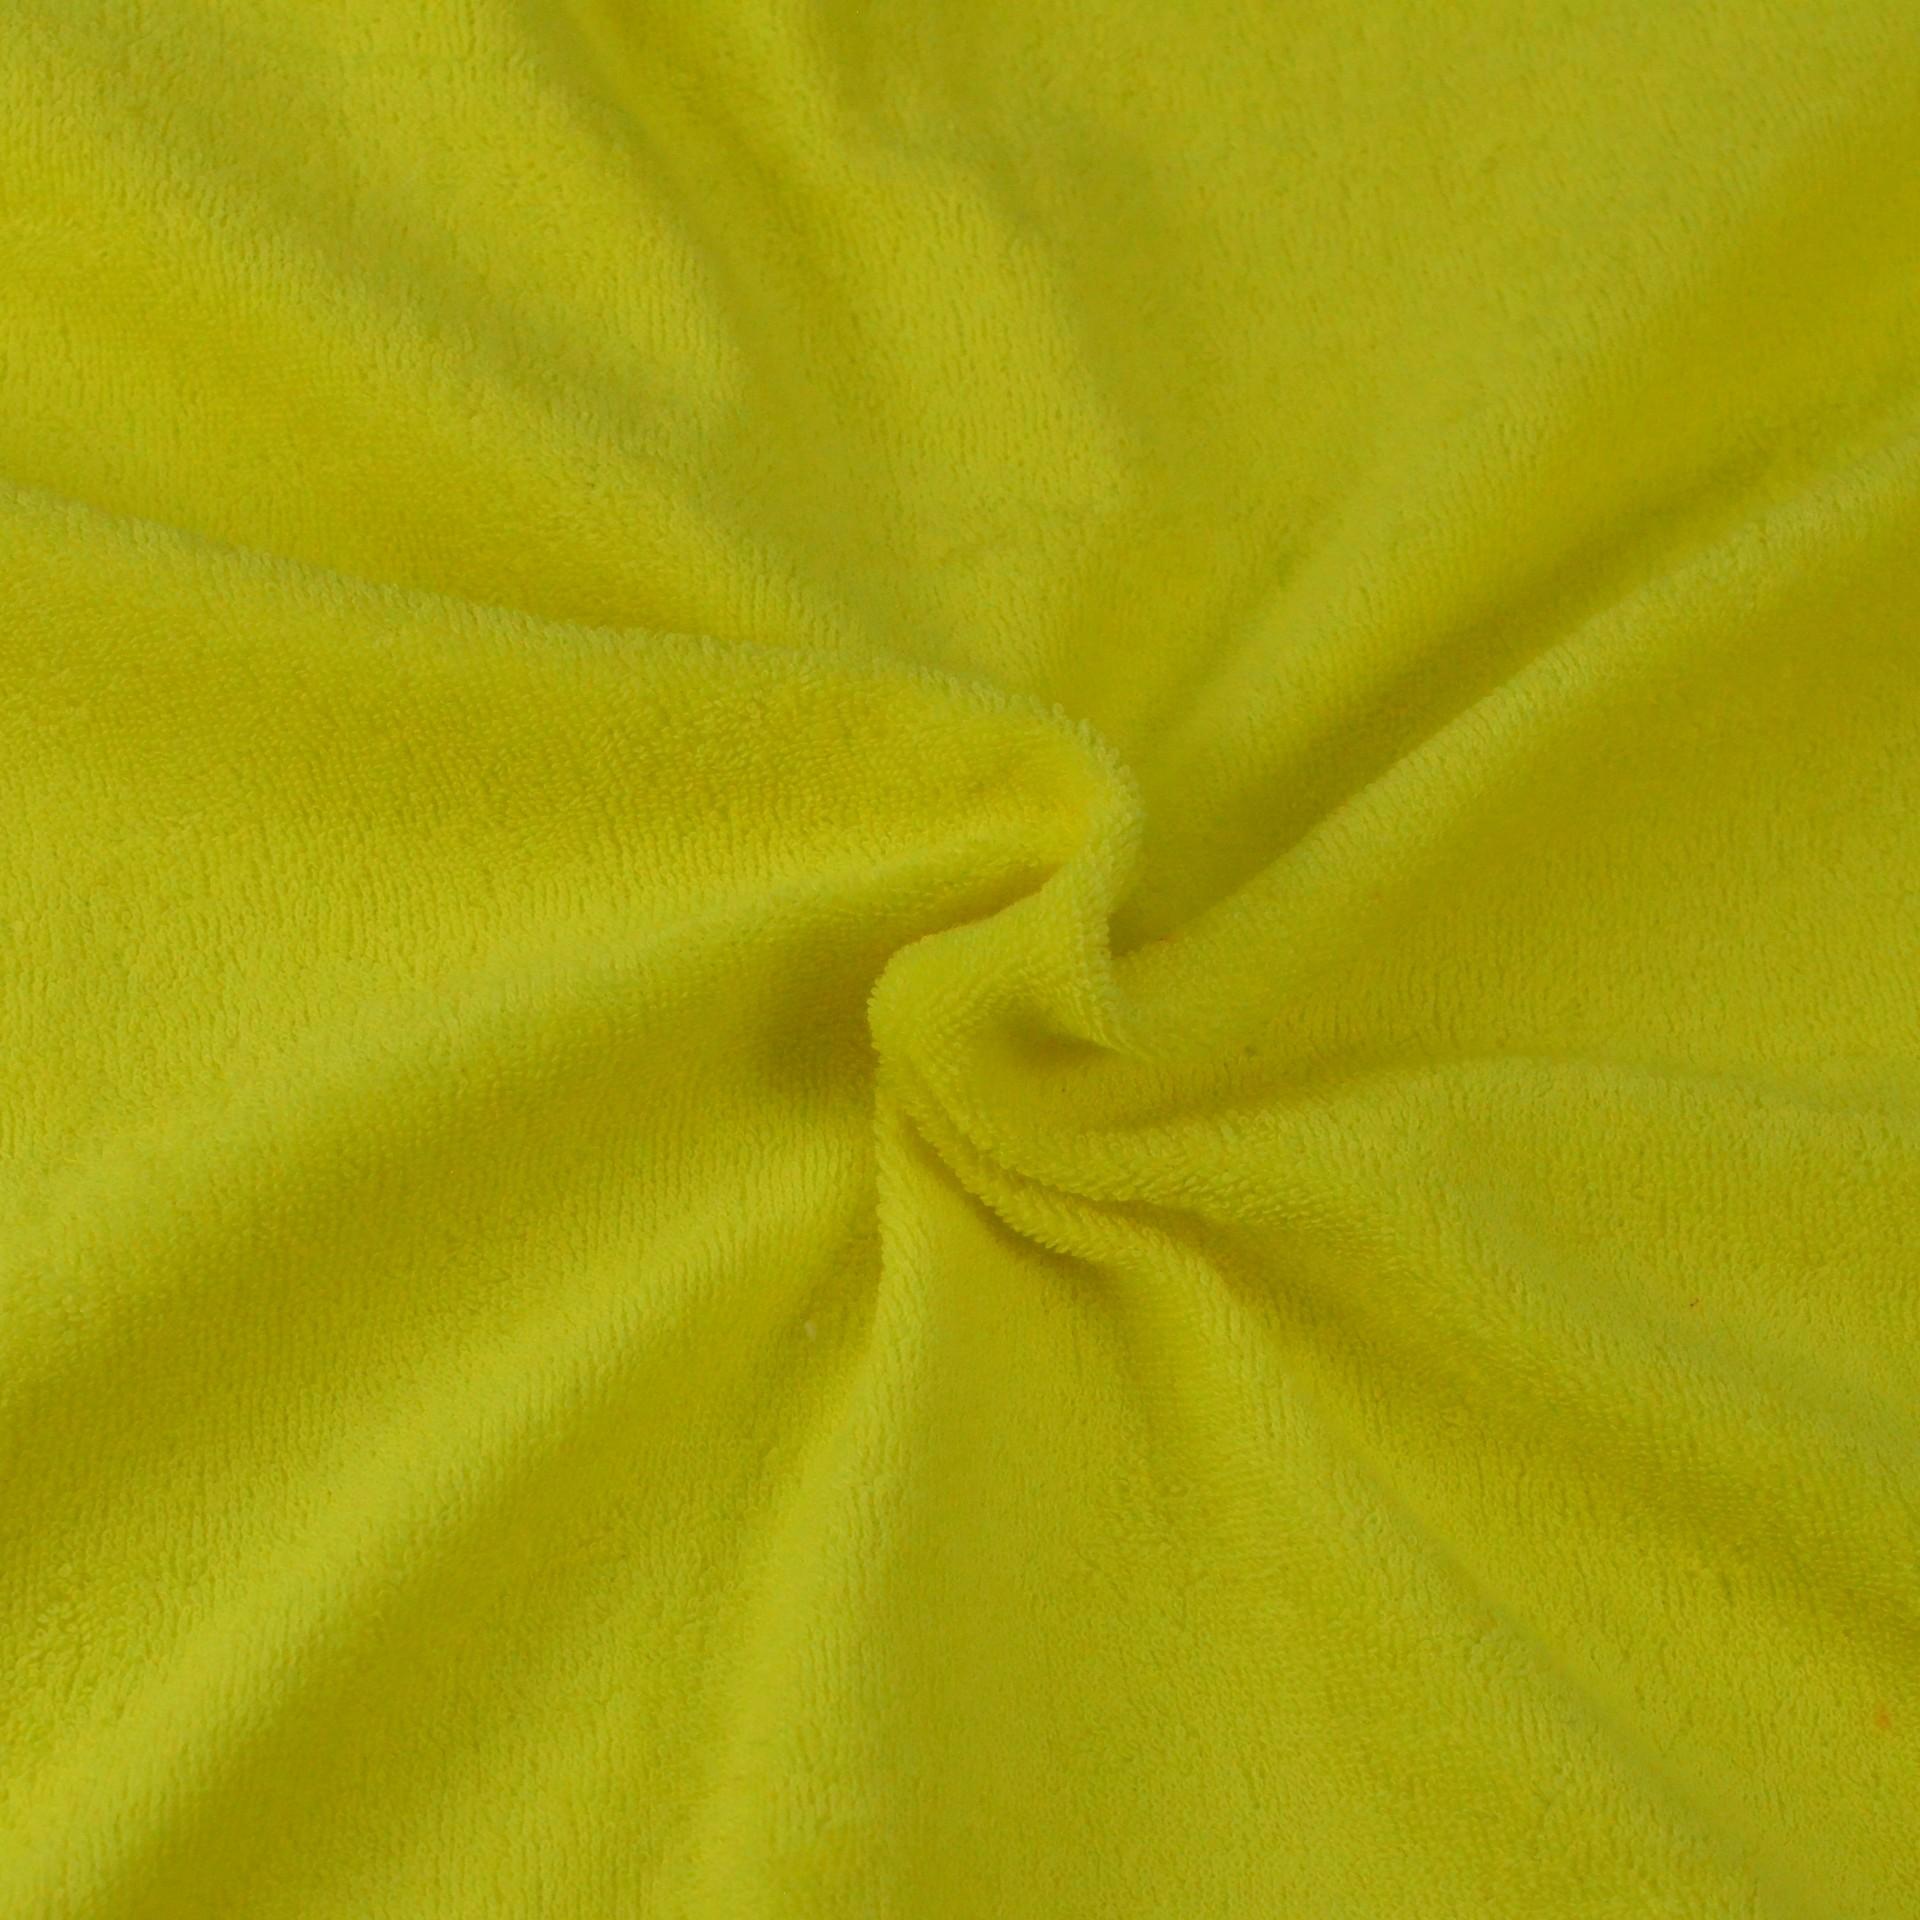 Froté prostěradlo citron, Výběr rozměru - 90x200cm